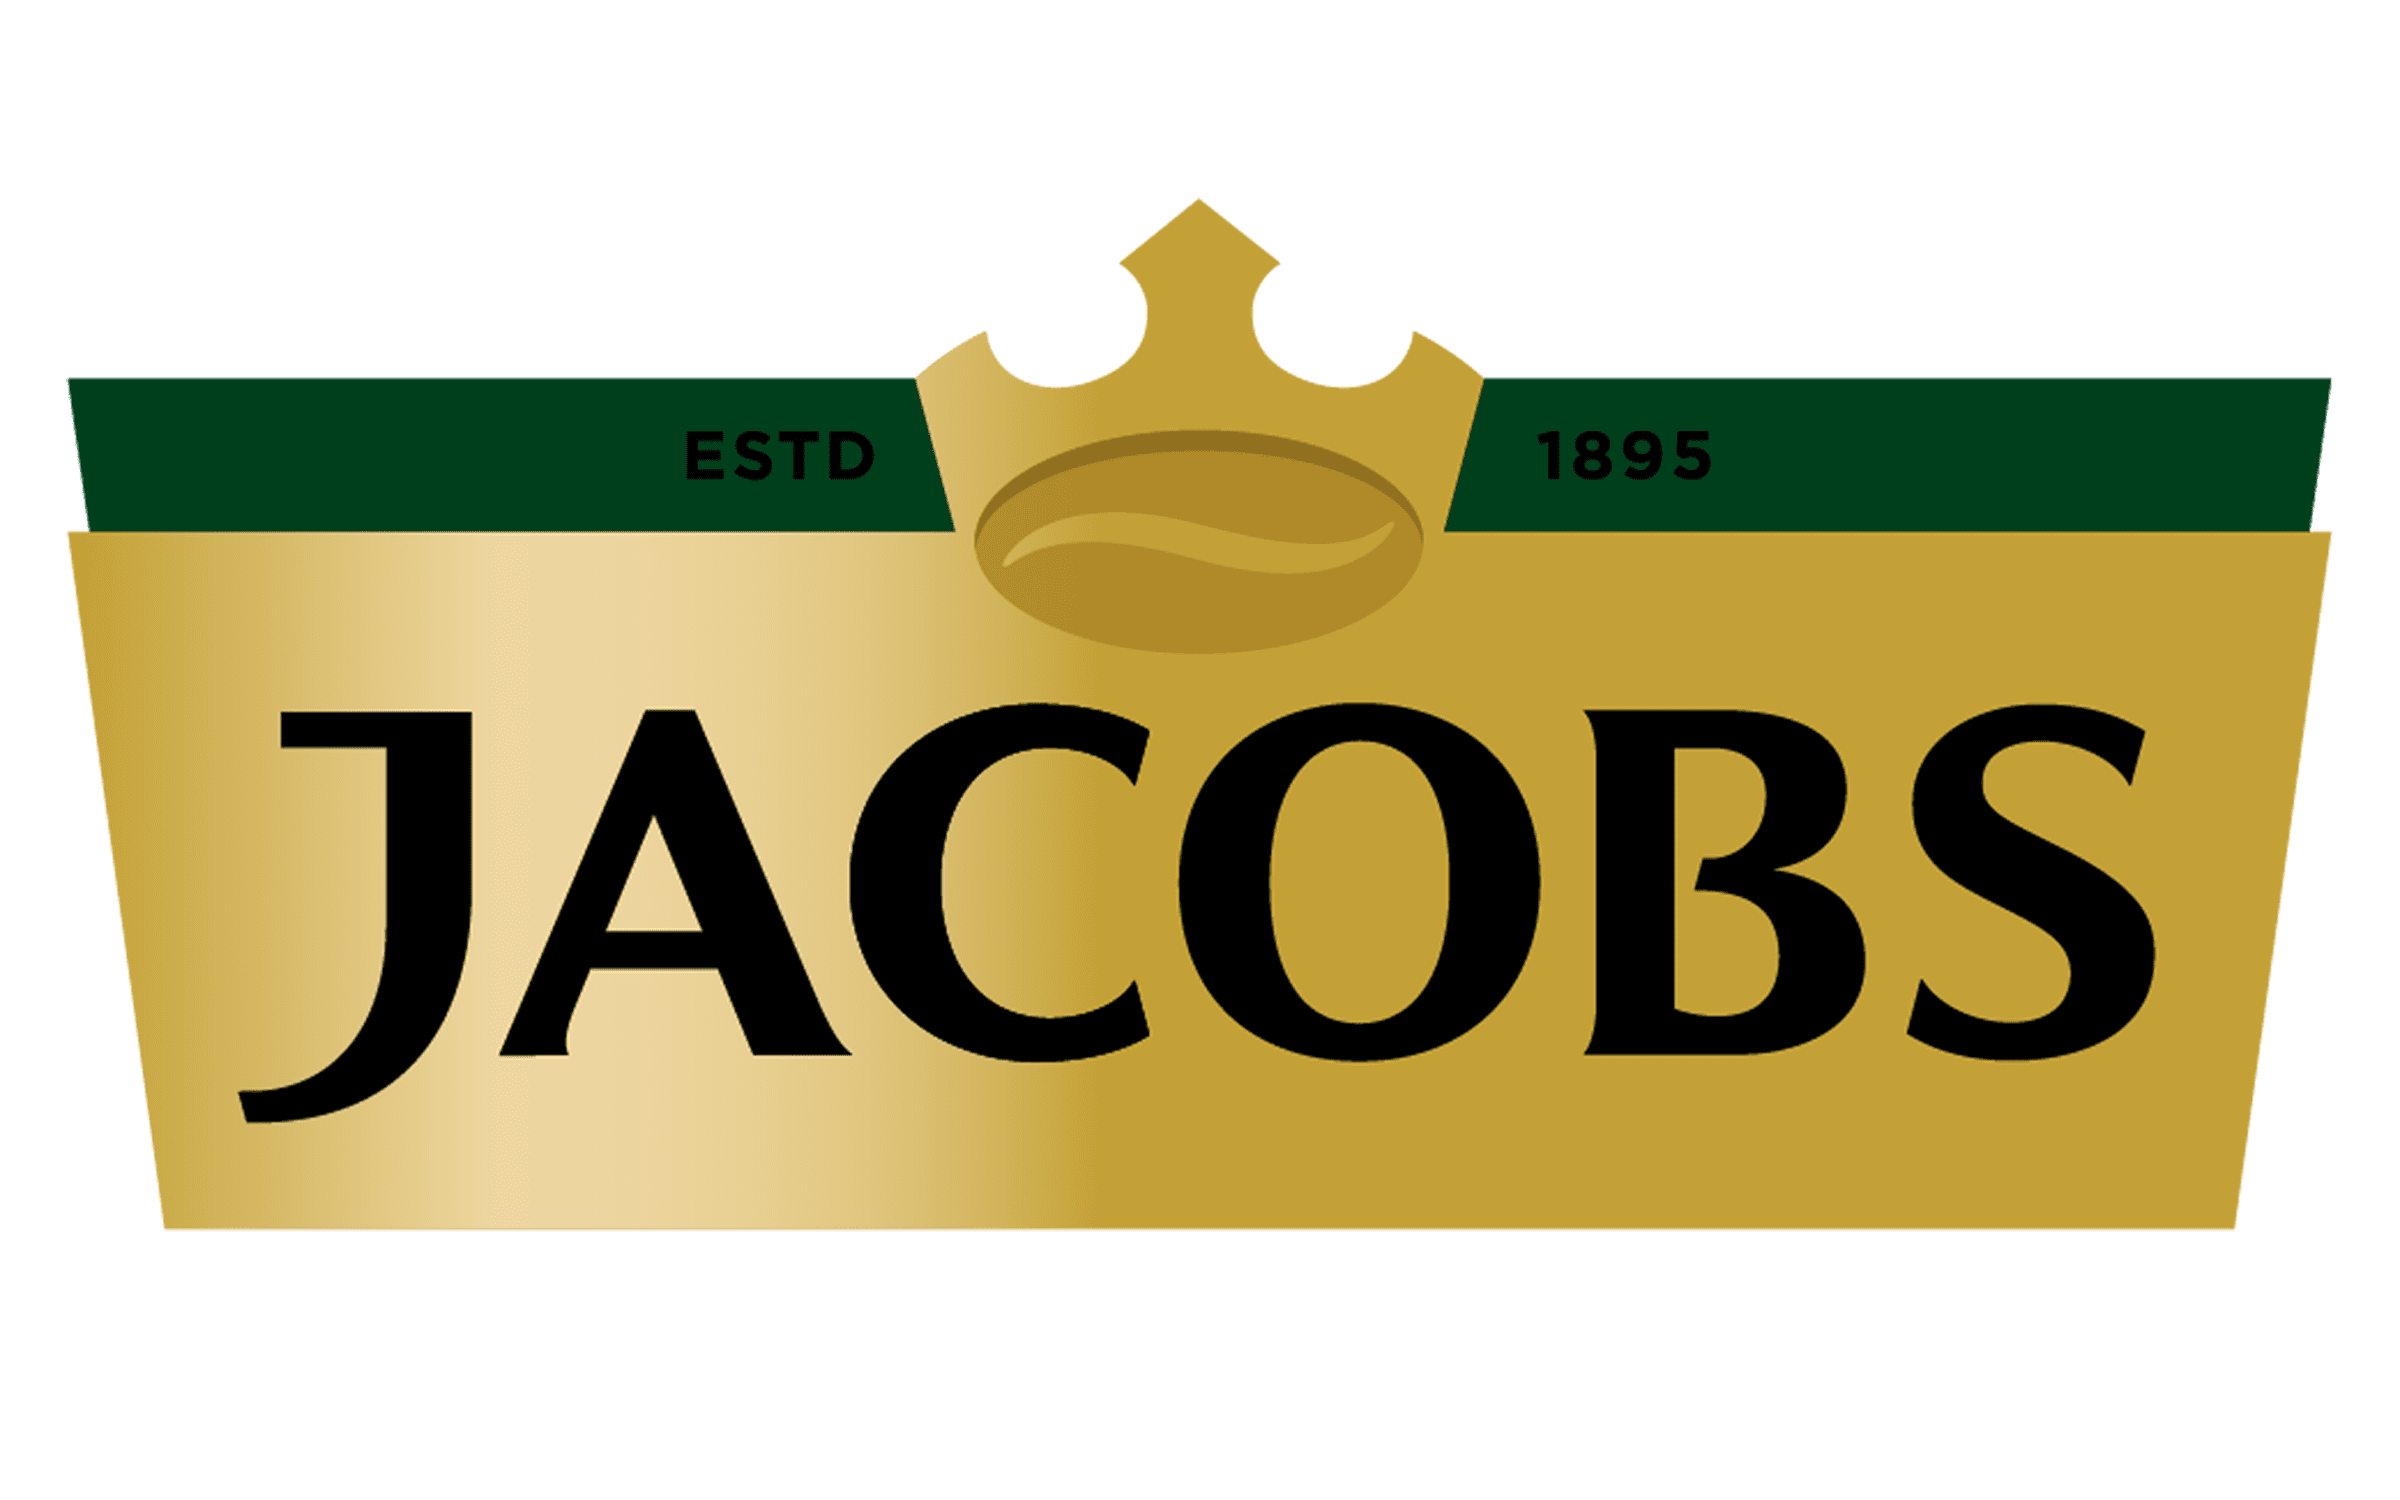 جاكوبس JACOBS